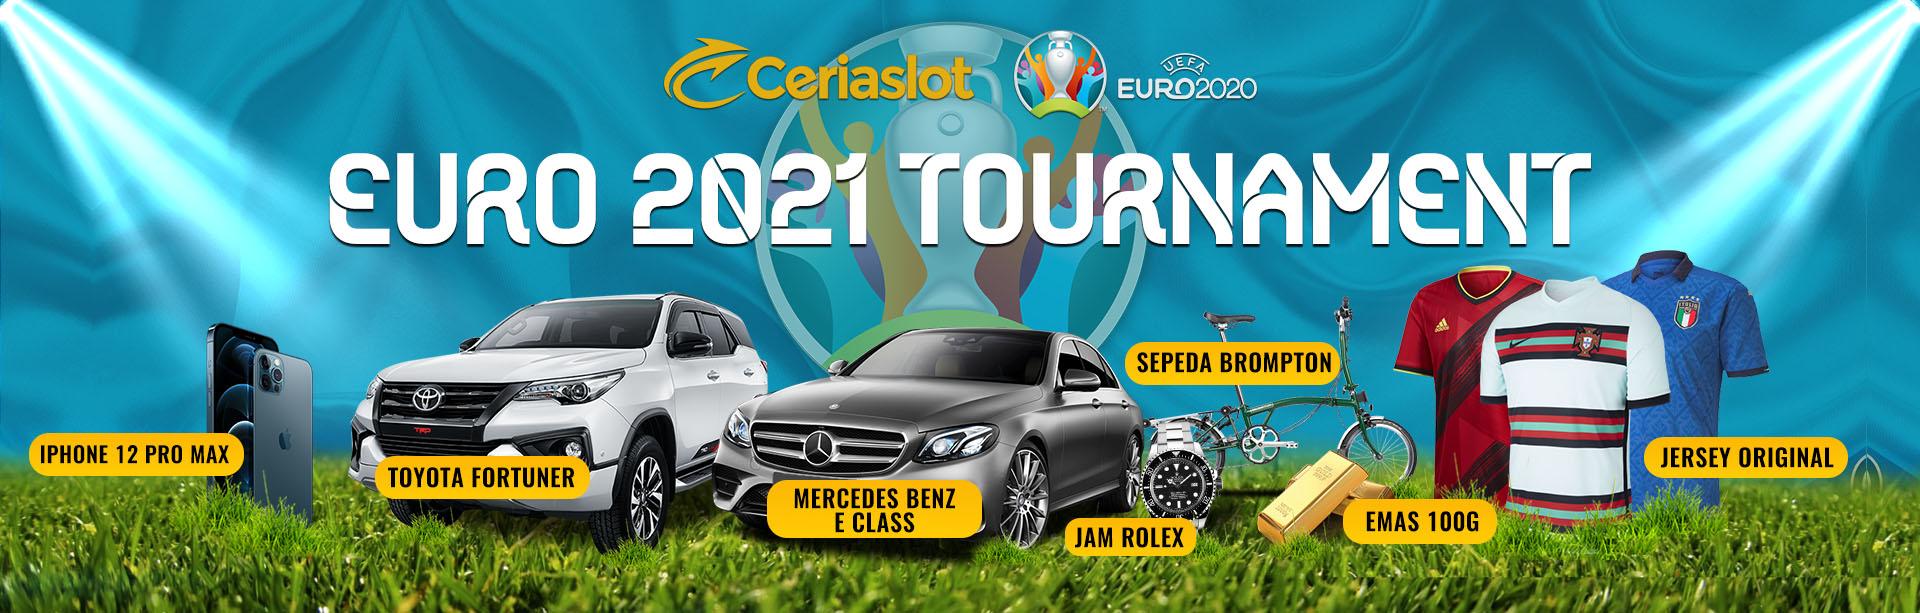 Event Euro 2020/2021